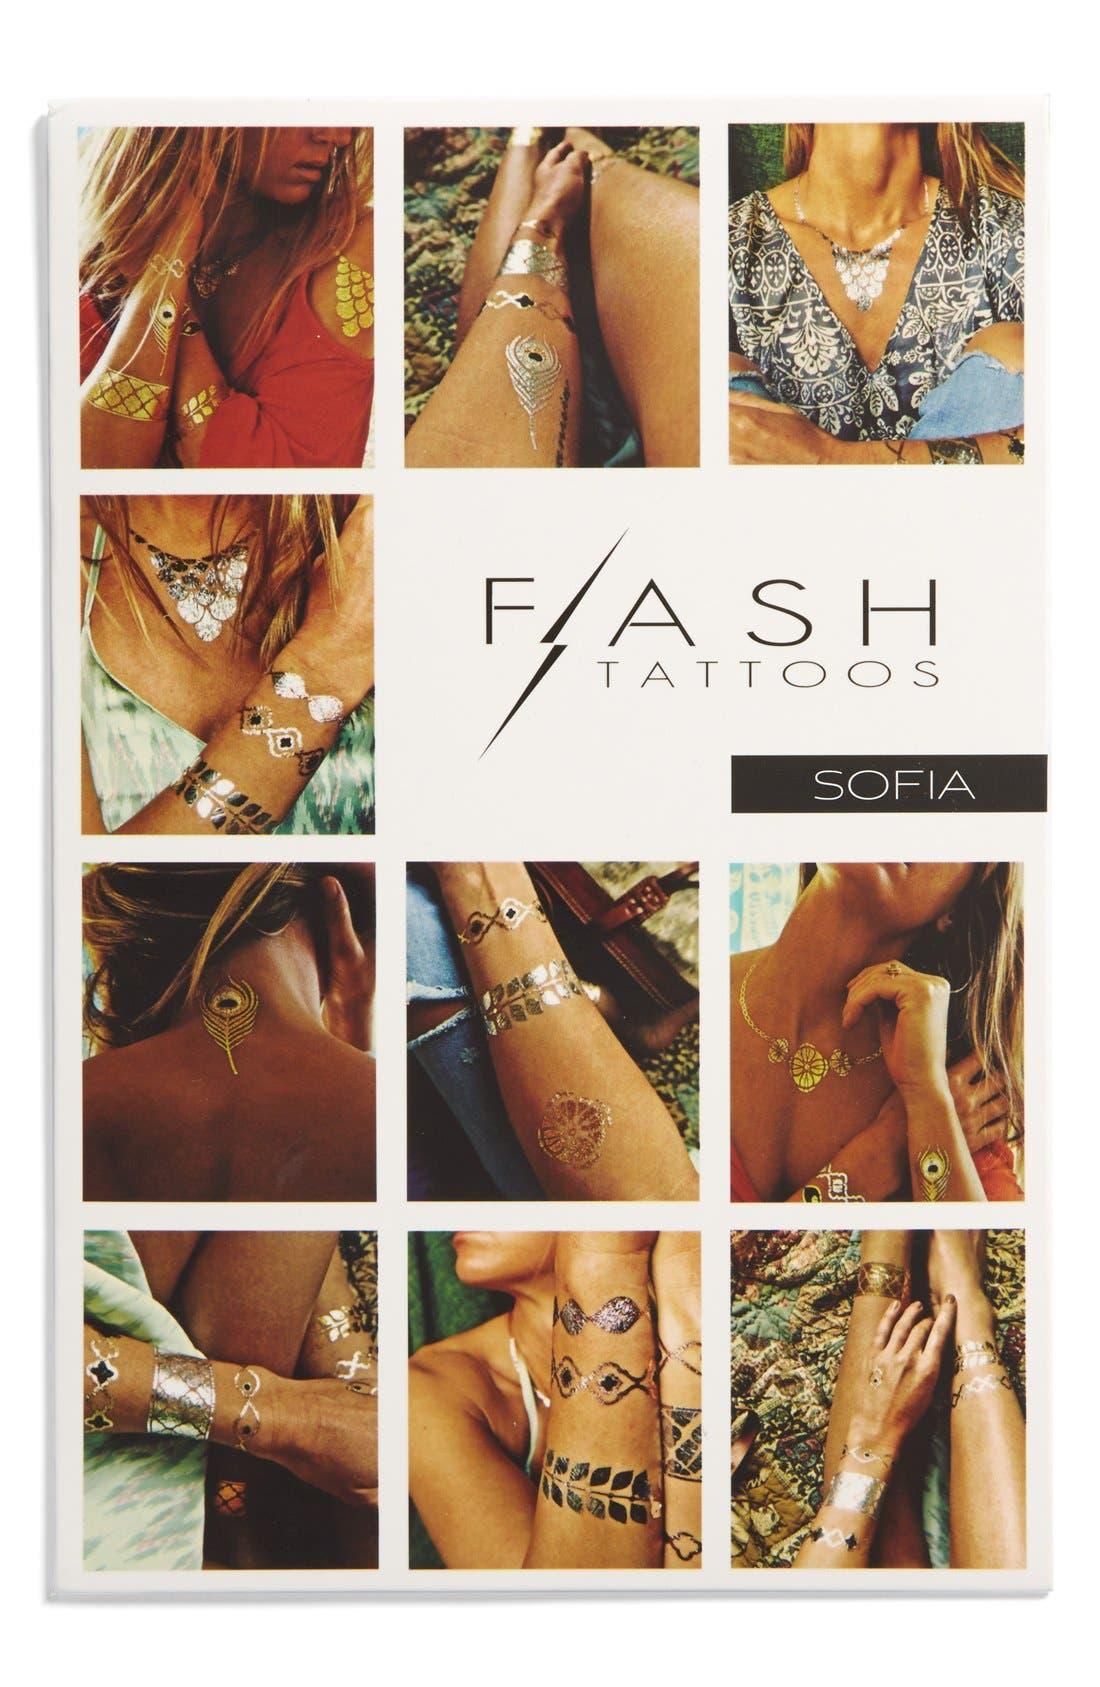 Alternate Image 1 Selected - Flash Tattoos 'Sofia' Temporary Tattoos